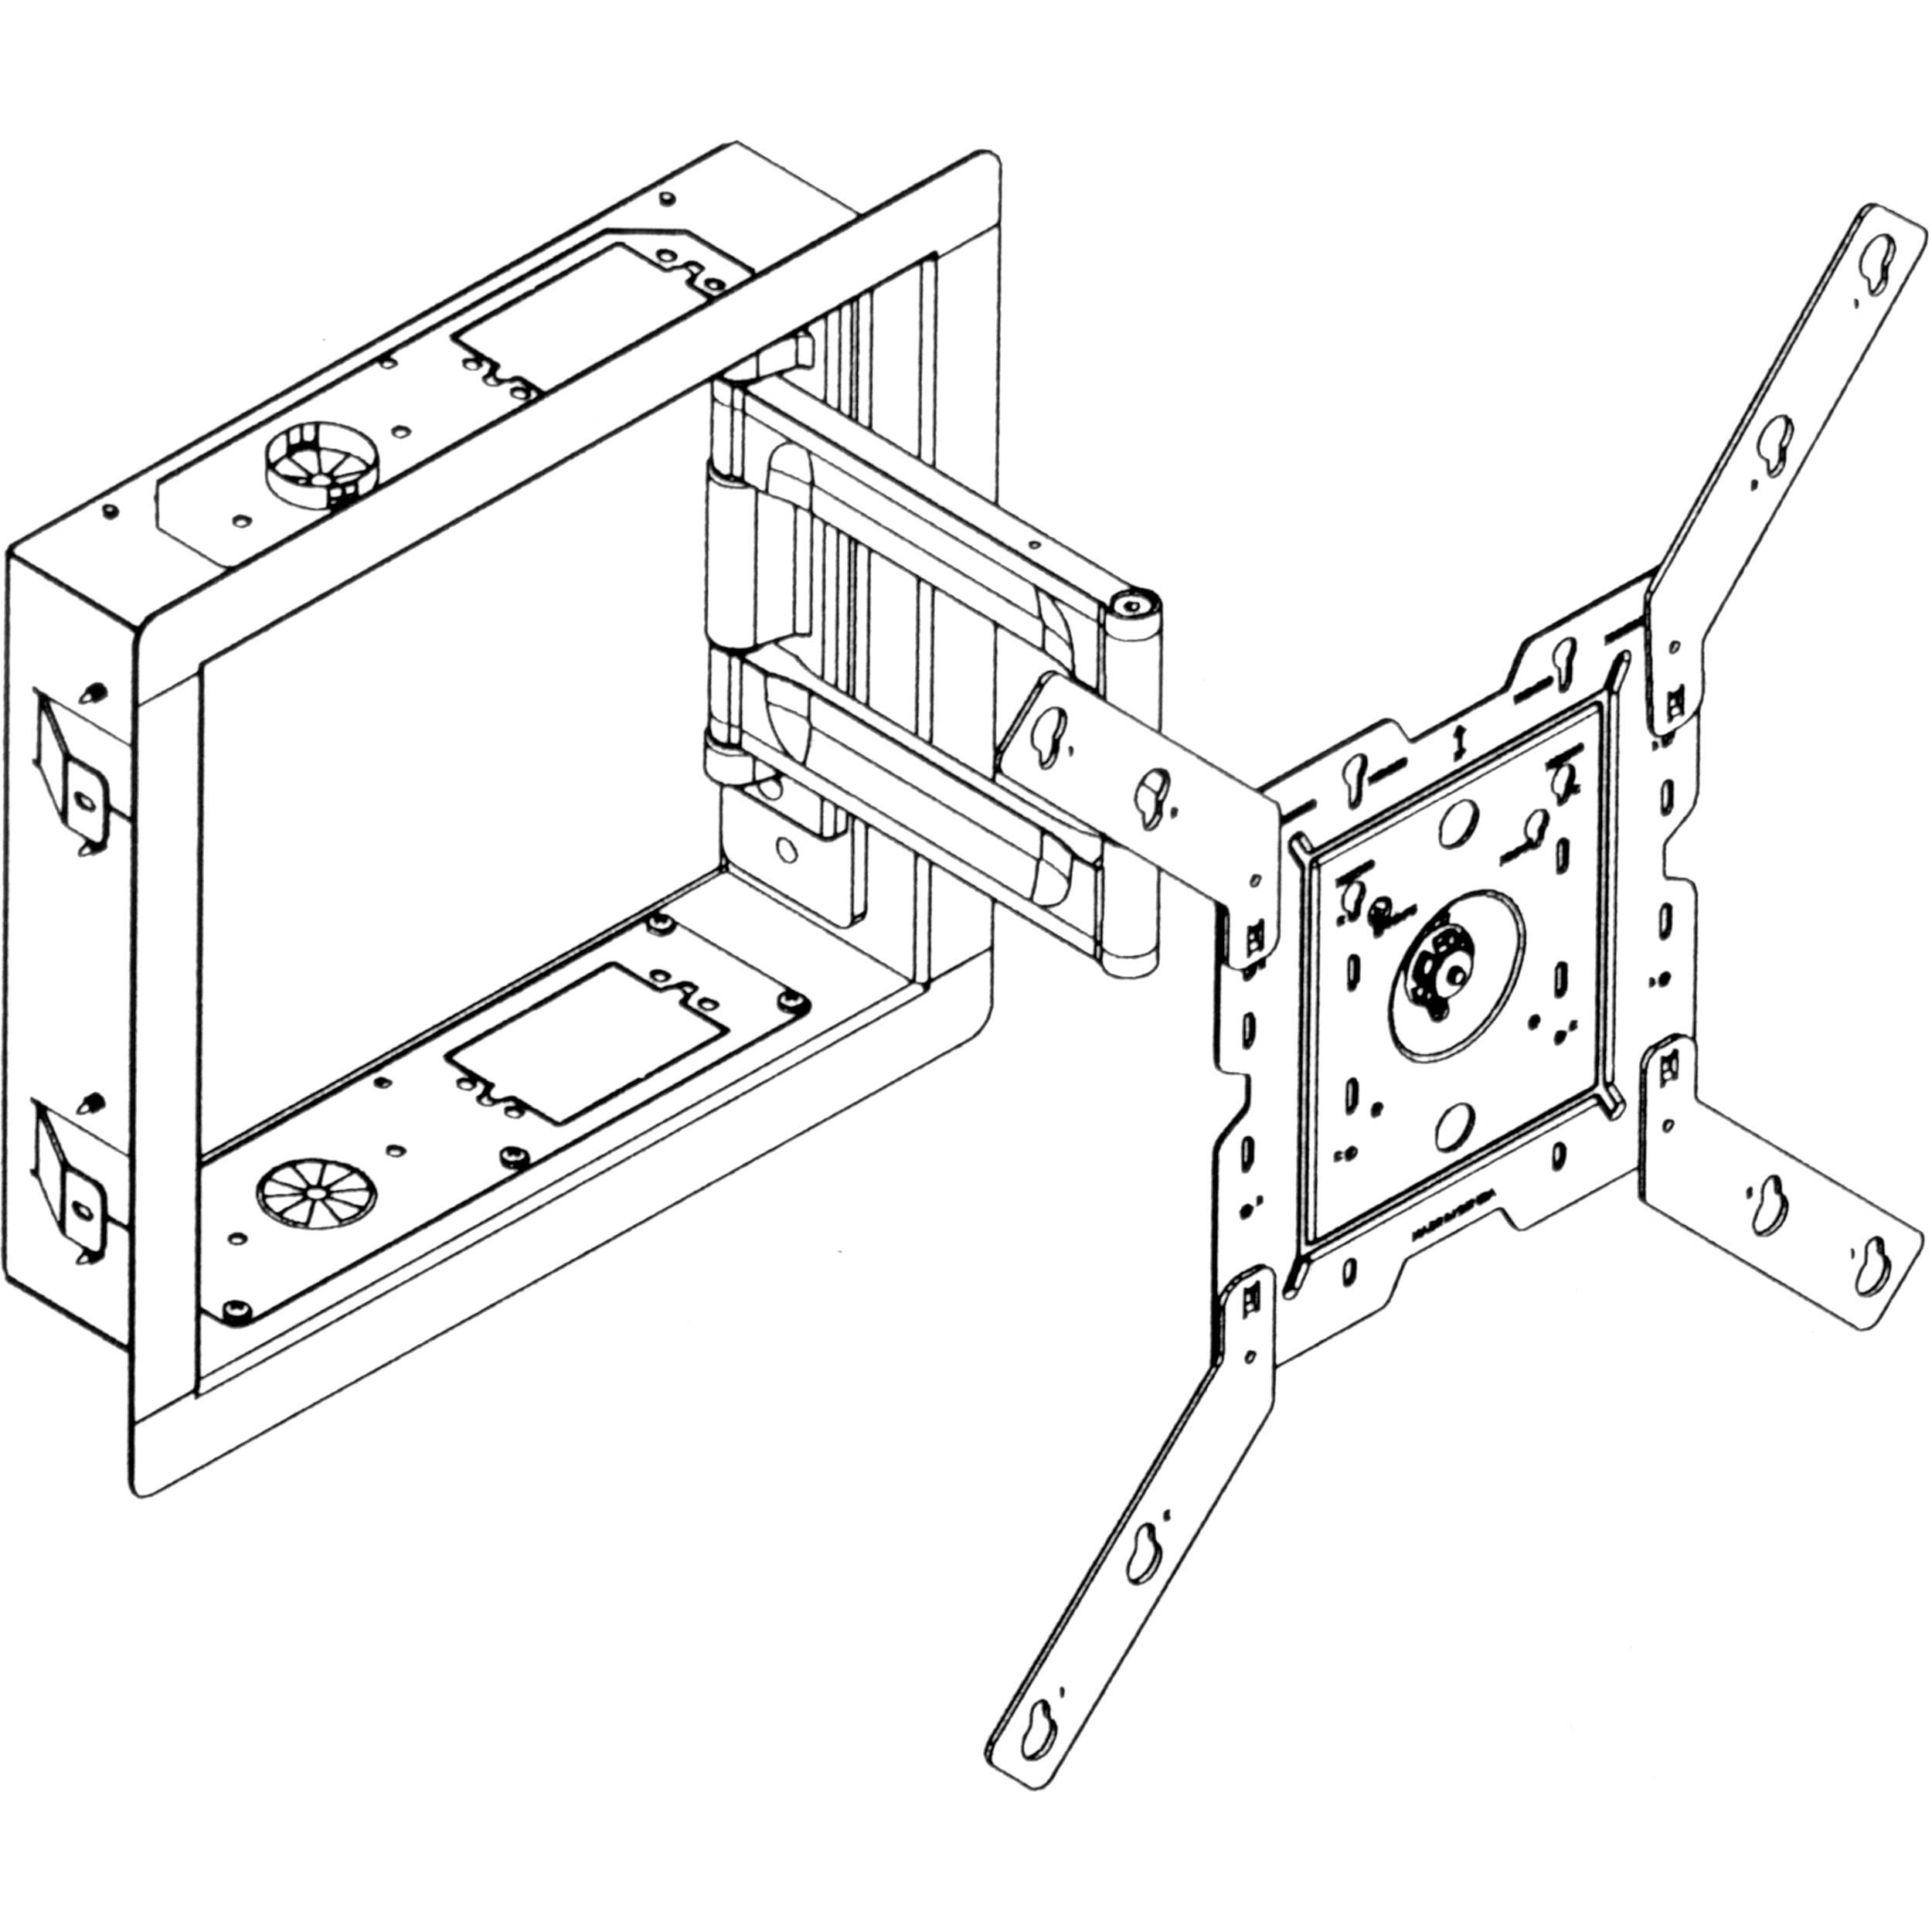 Peerless Av Ib40 W In Wall Box For Lcd Screens White Ib40 W